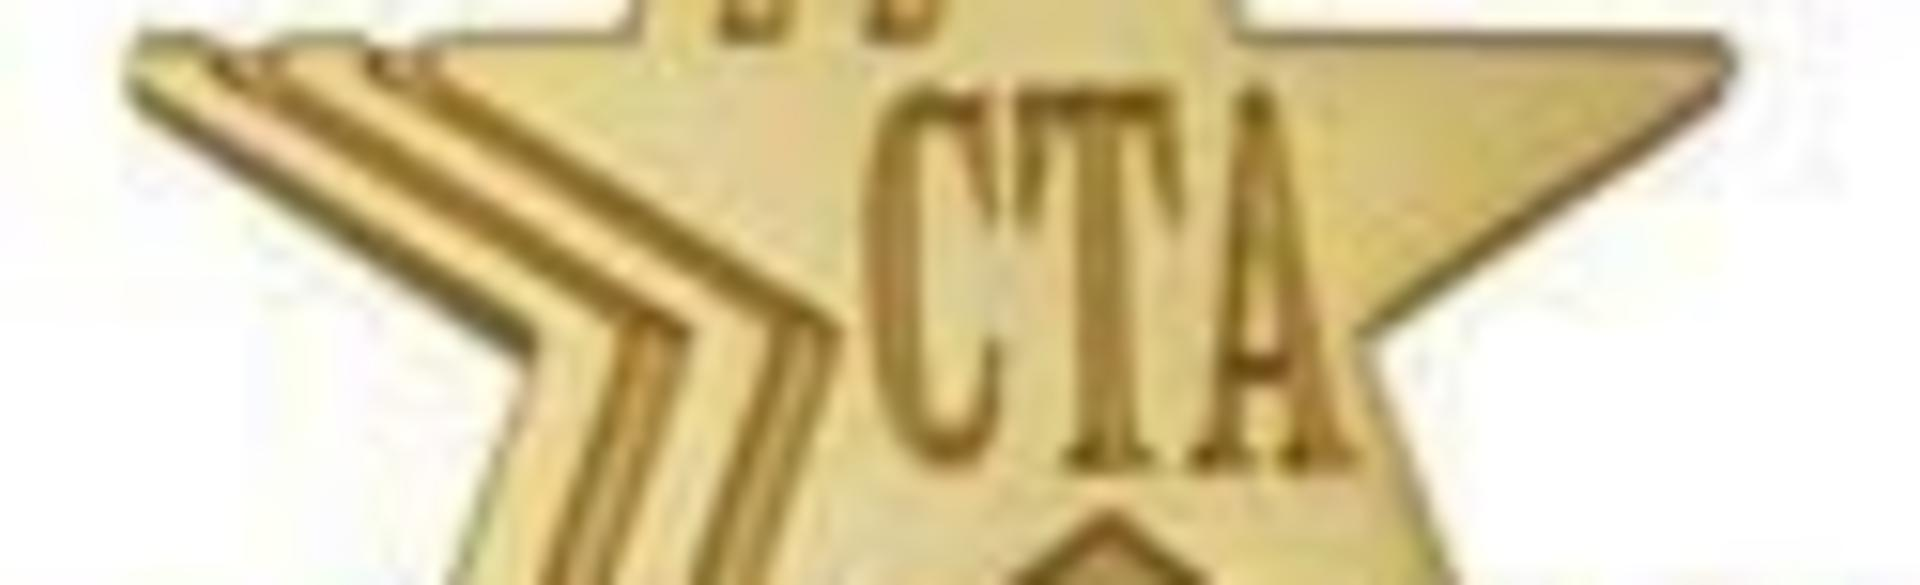 CTA Pin